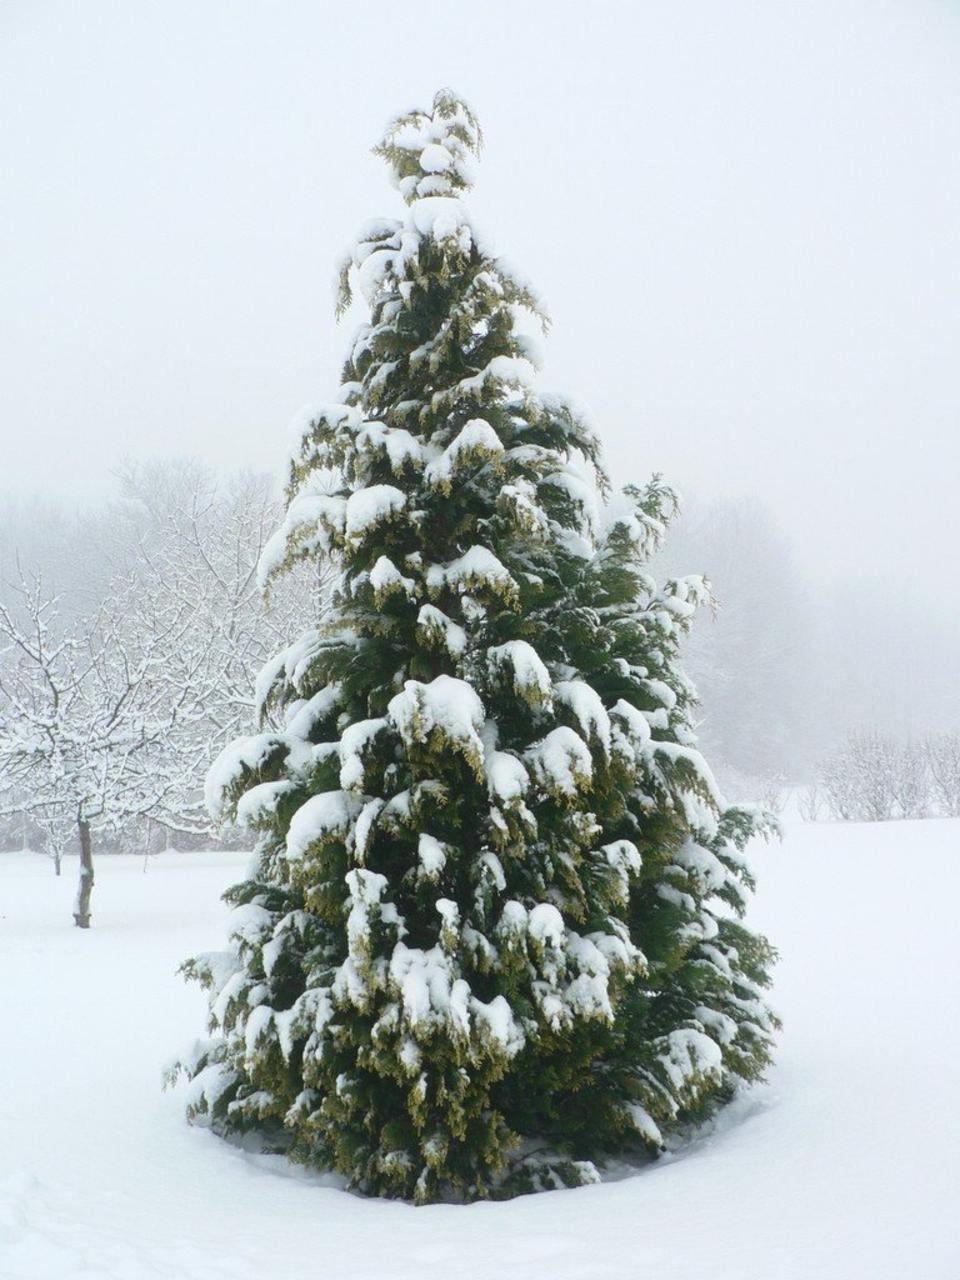 spruce tree snow - photo #31